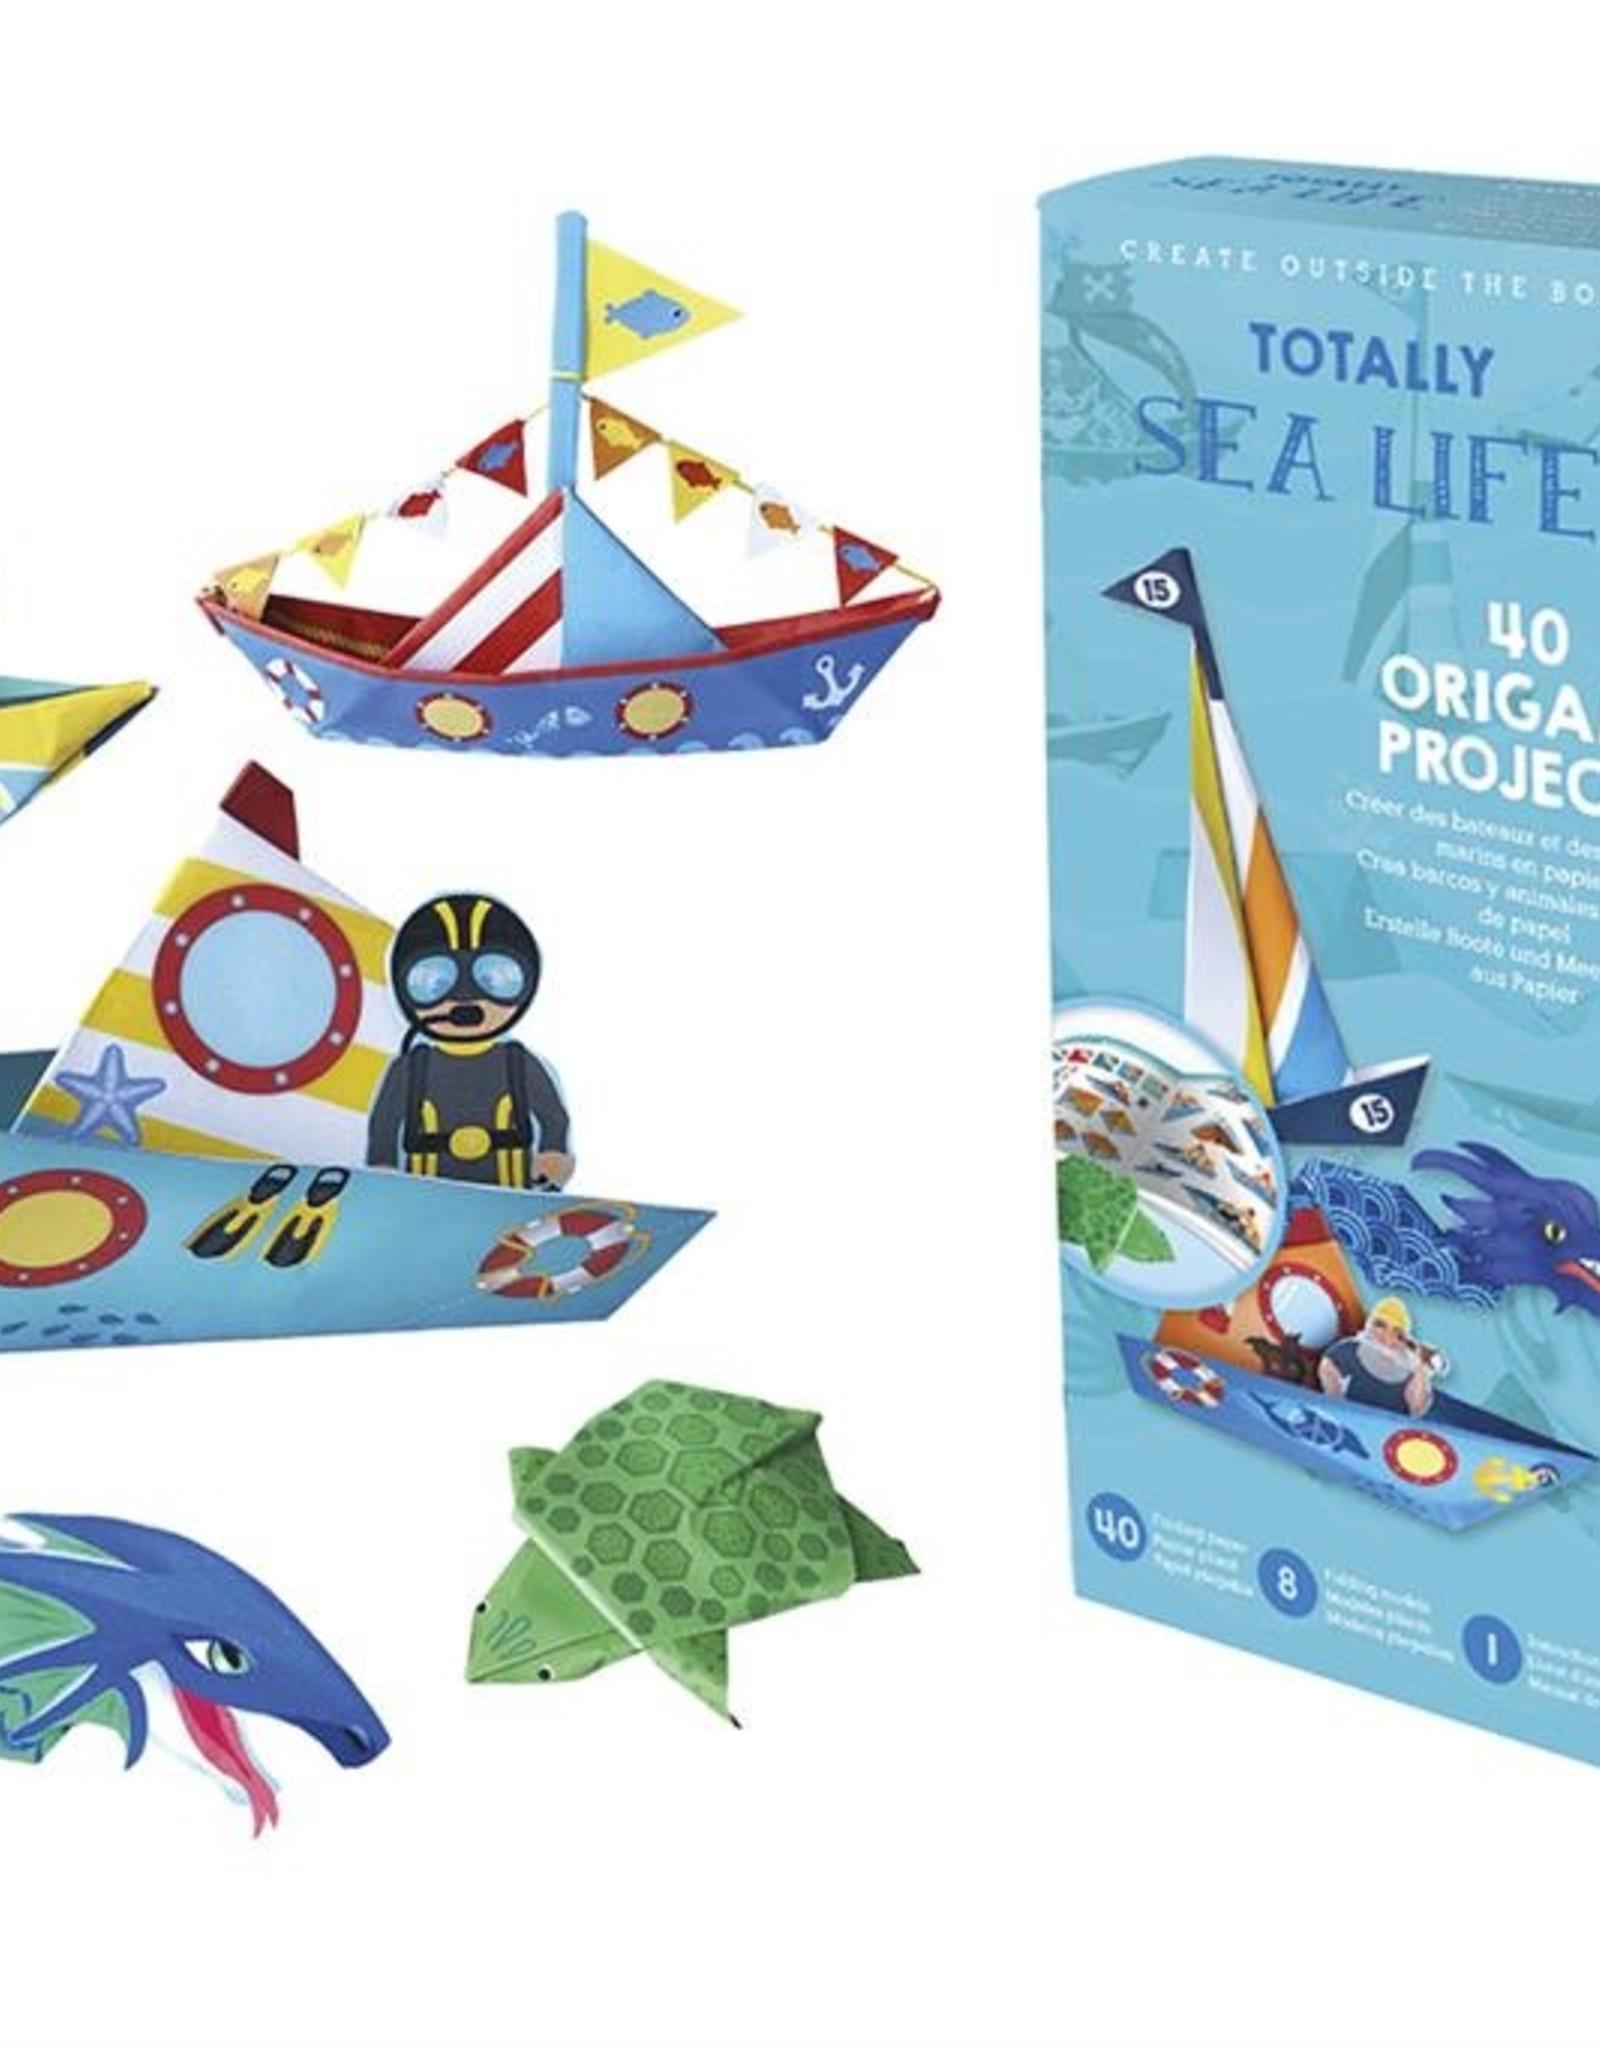 Totally Sea Life